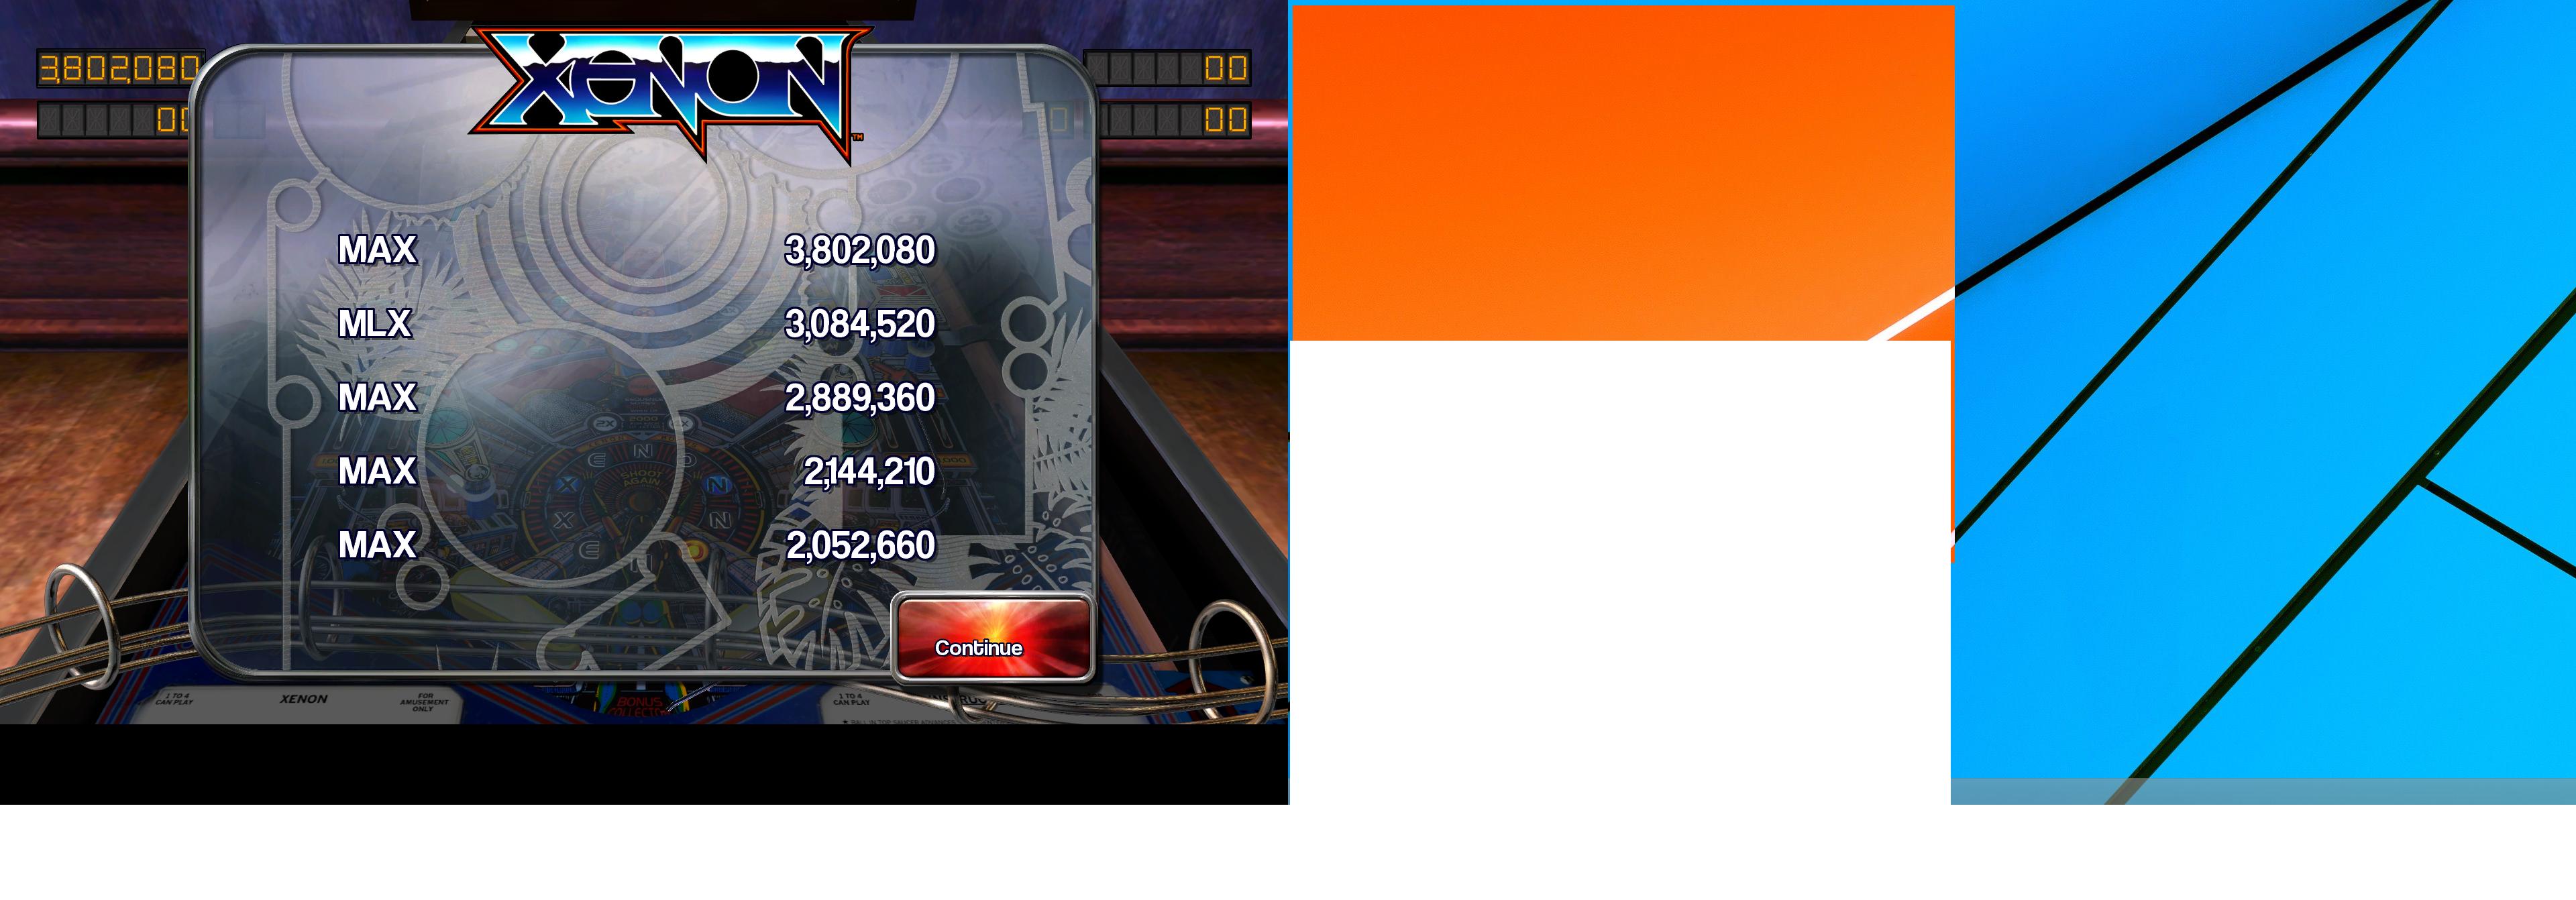 Maxwel: Pinball Arcade: Xenon (PC) 3,802,080 points on 2015-06-12 14:14:13